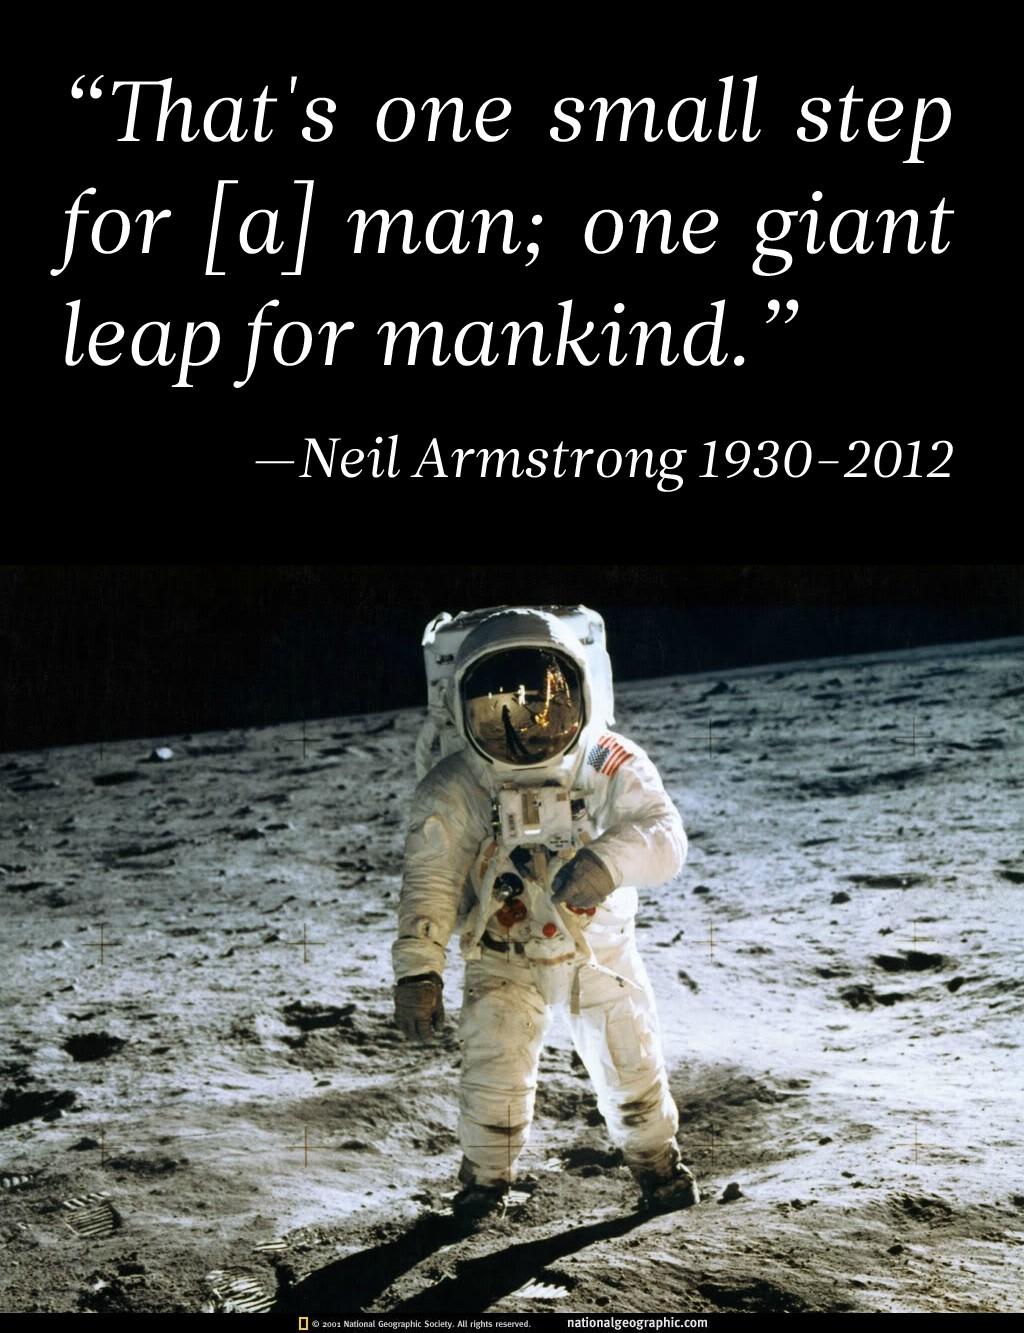 Apollo 13 Quotes Ele quotes about apollo 11 (28 quotes)